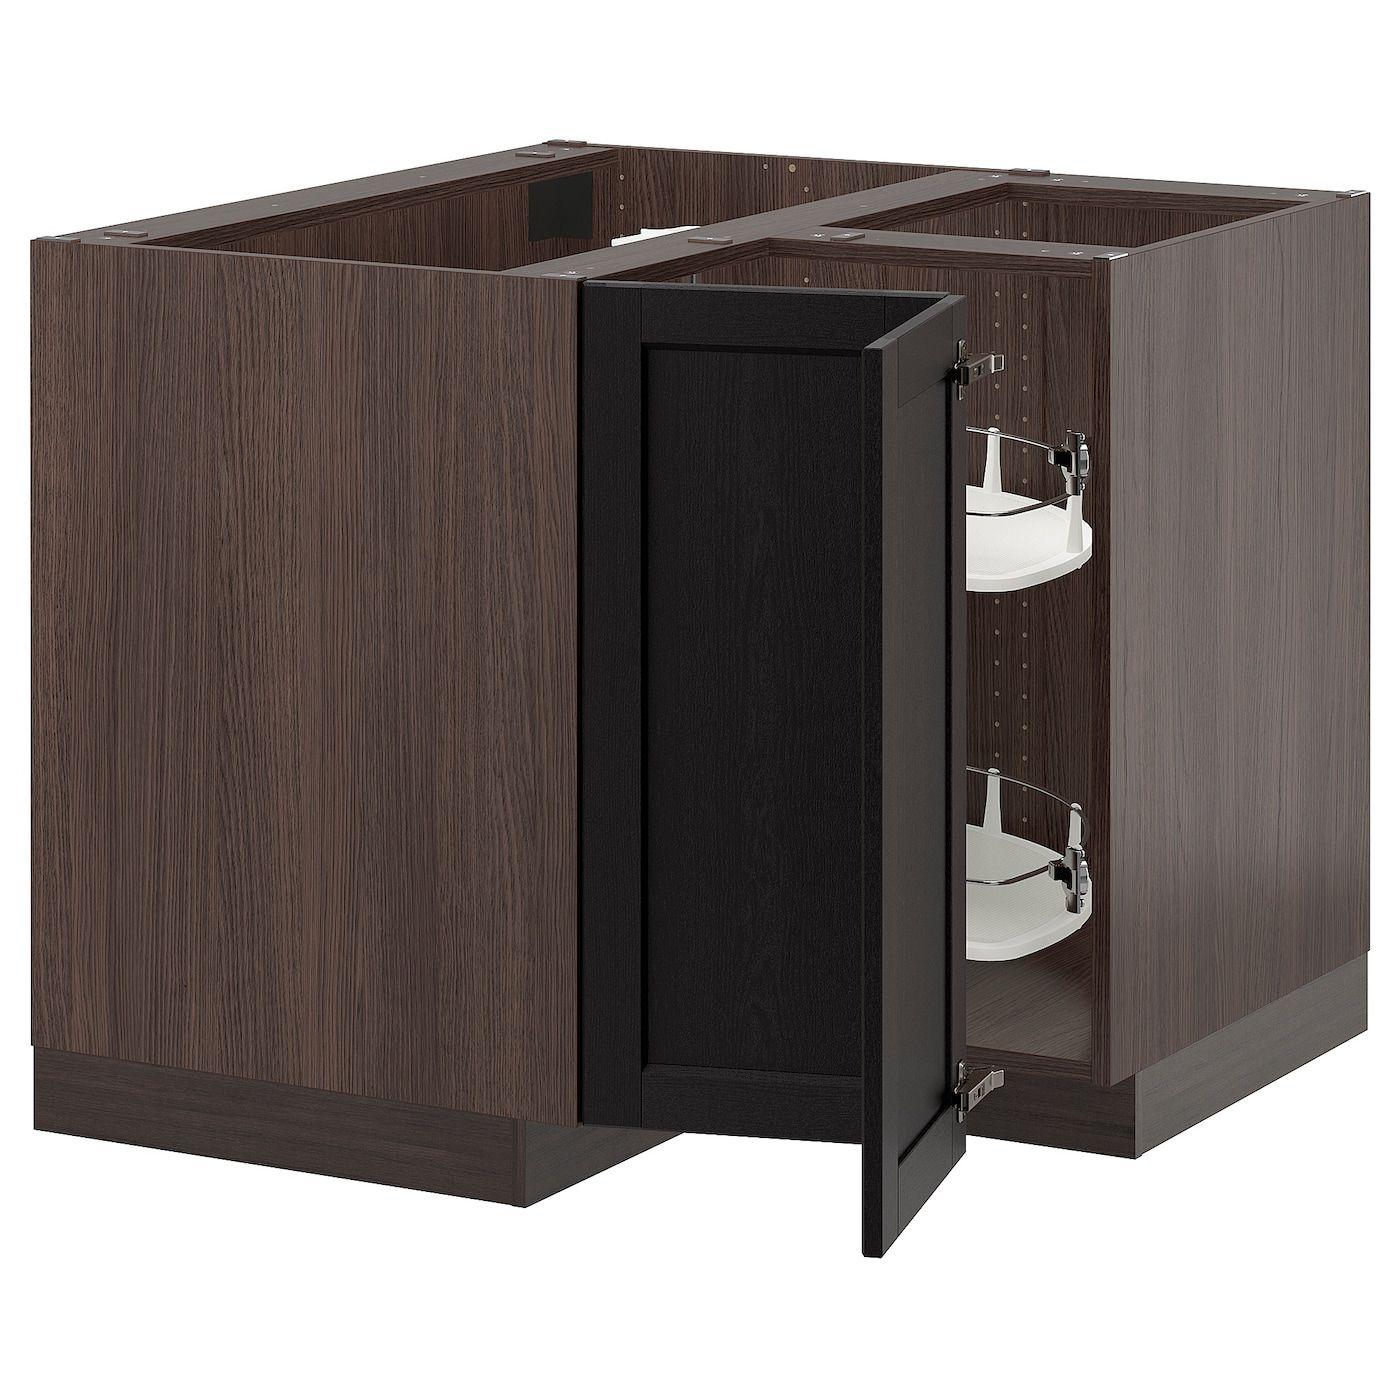 IKEA SEKTION wood effect brown Corner base with